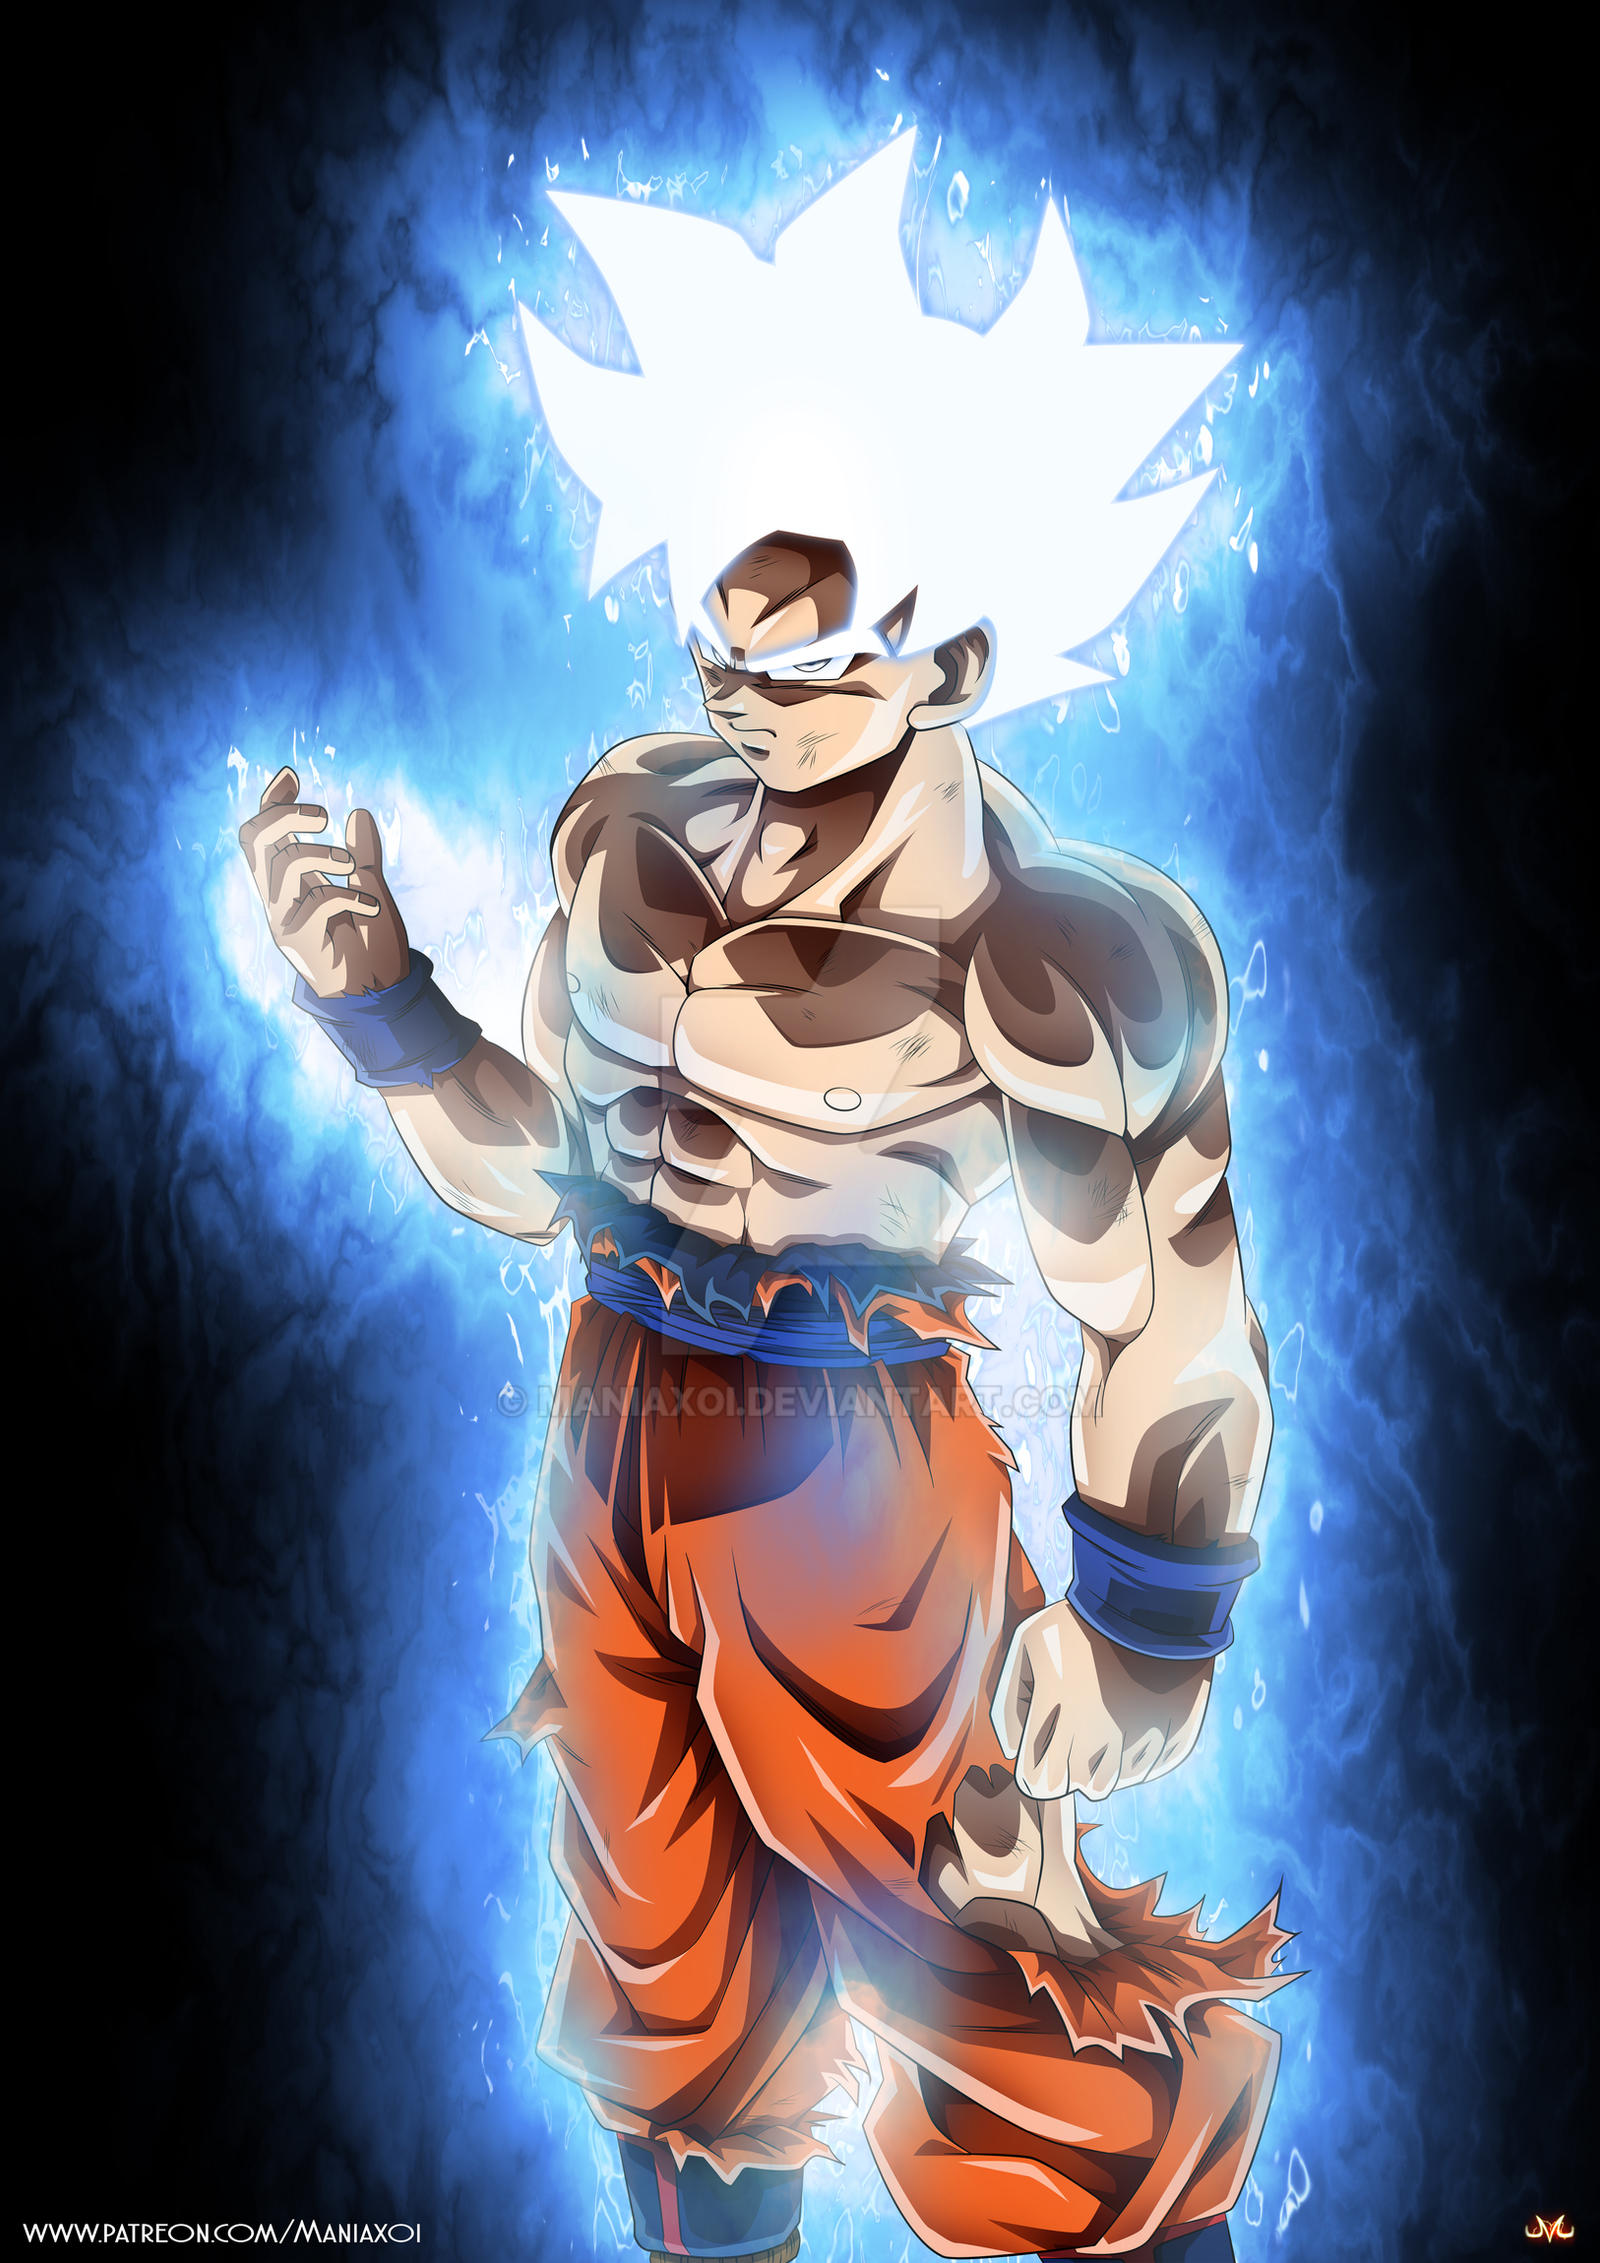 Goku mastered ultra instinct 2 by maniaxoi on deviantart - Goku ultra instinct mastered wallpaper ...